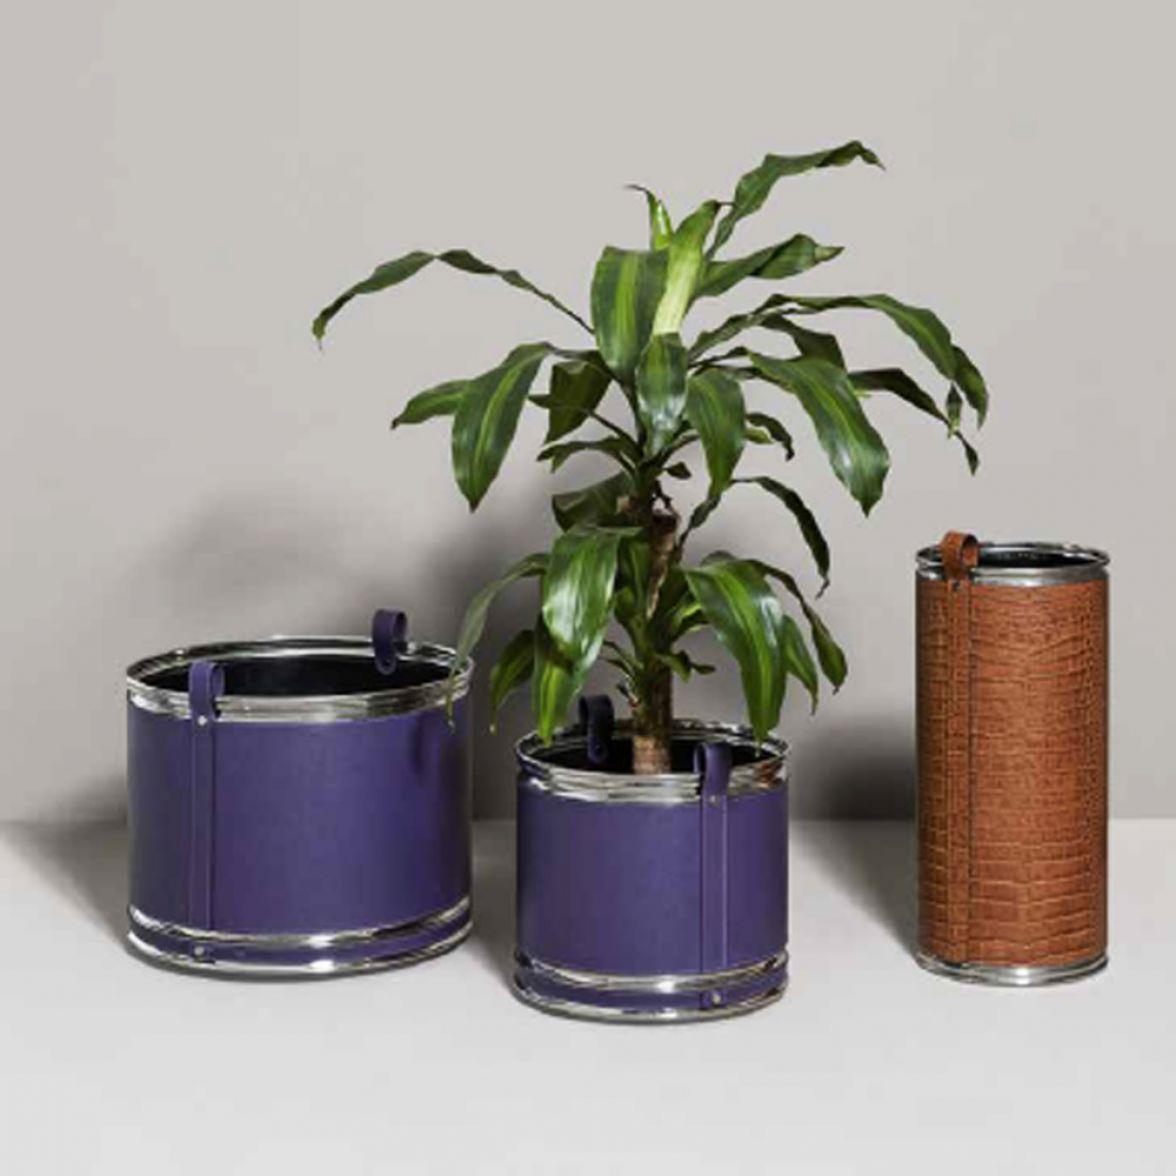 Cachepot Baskets фото цена